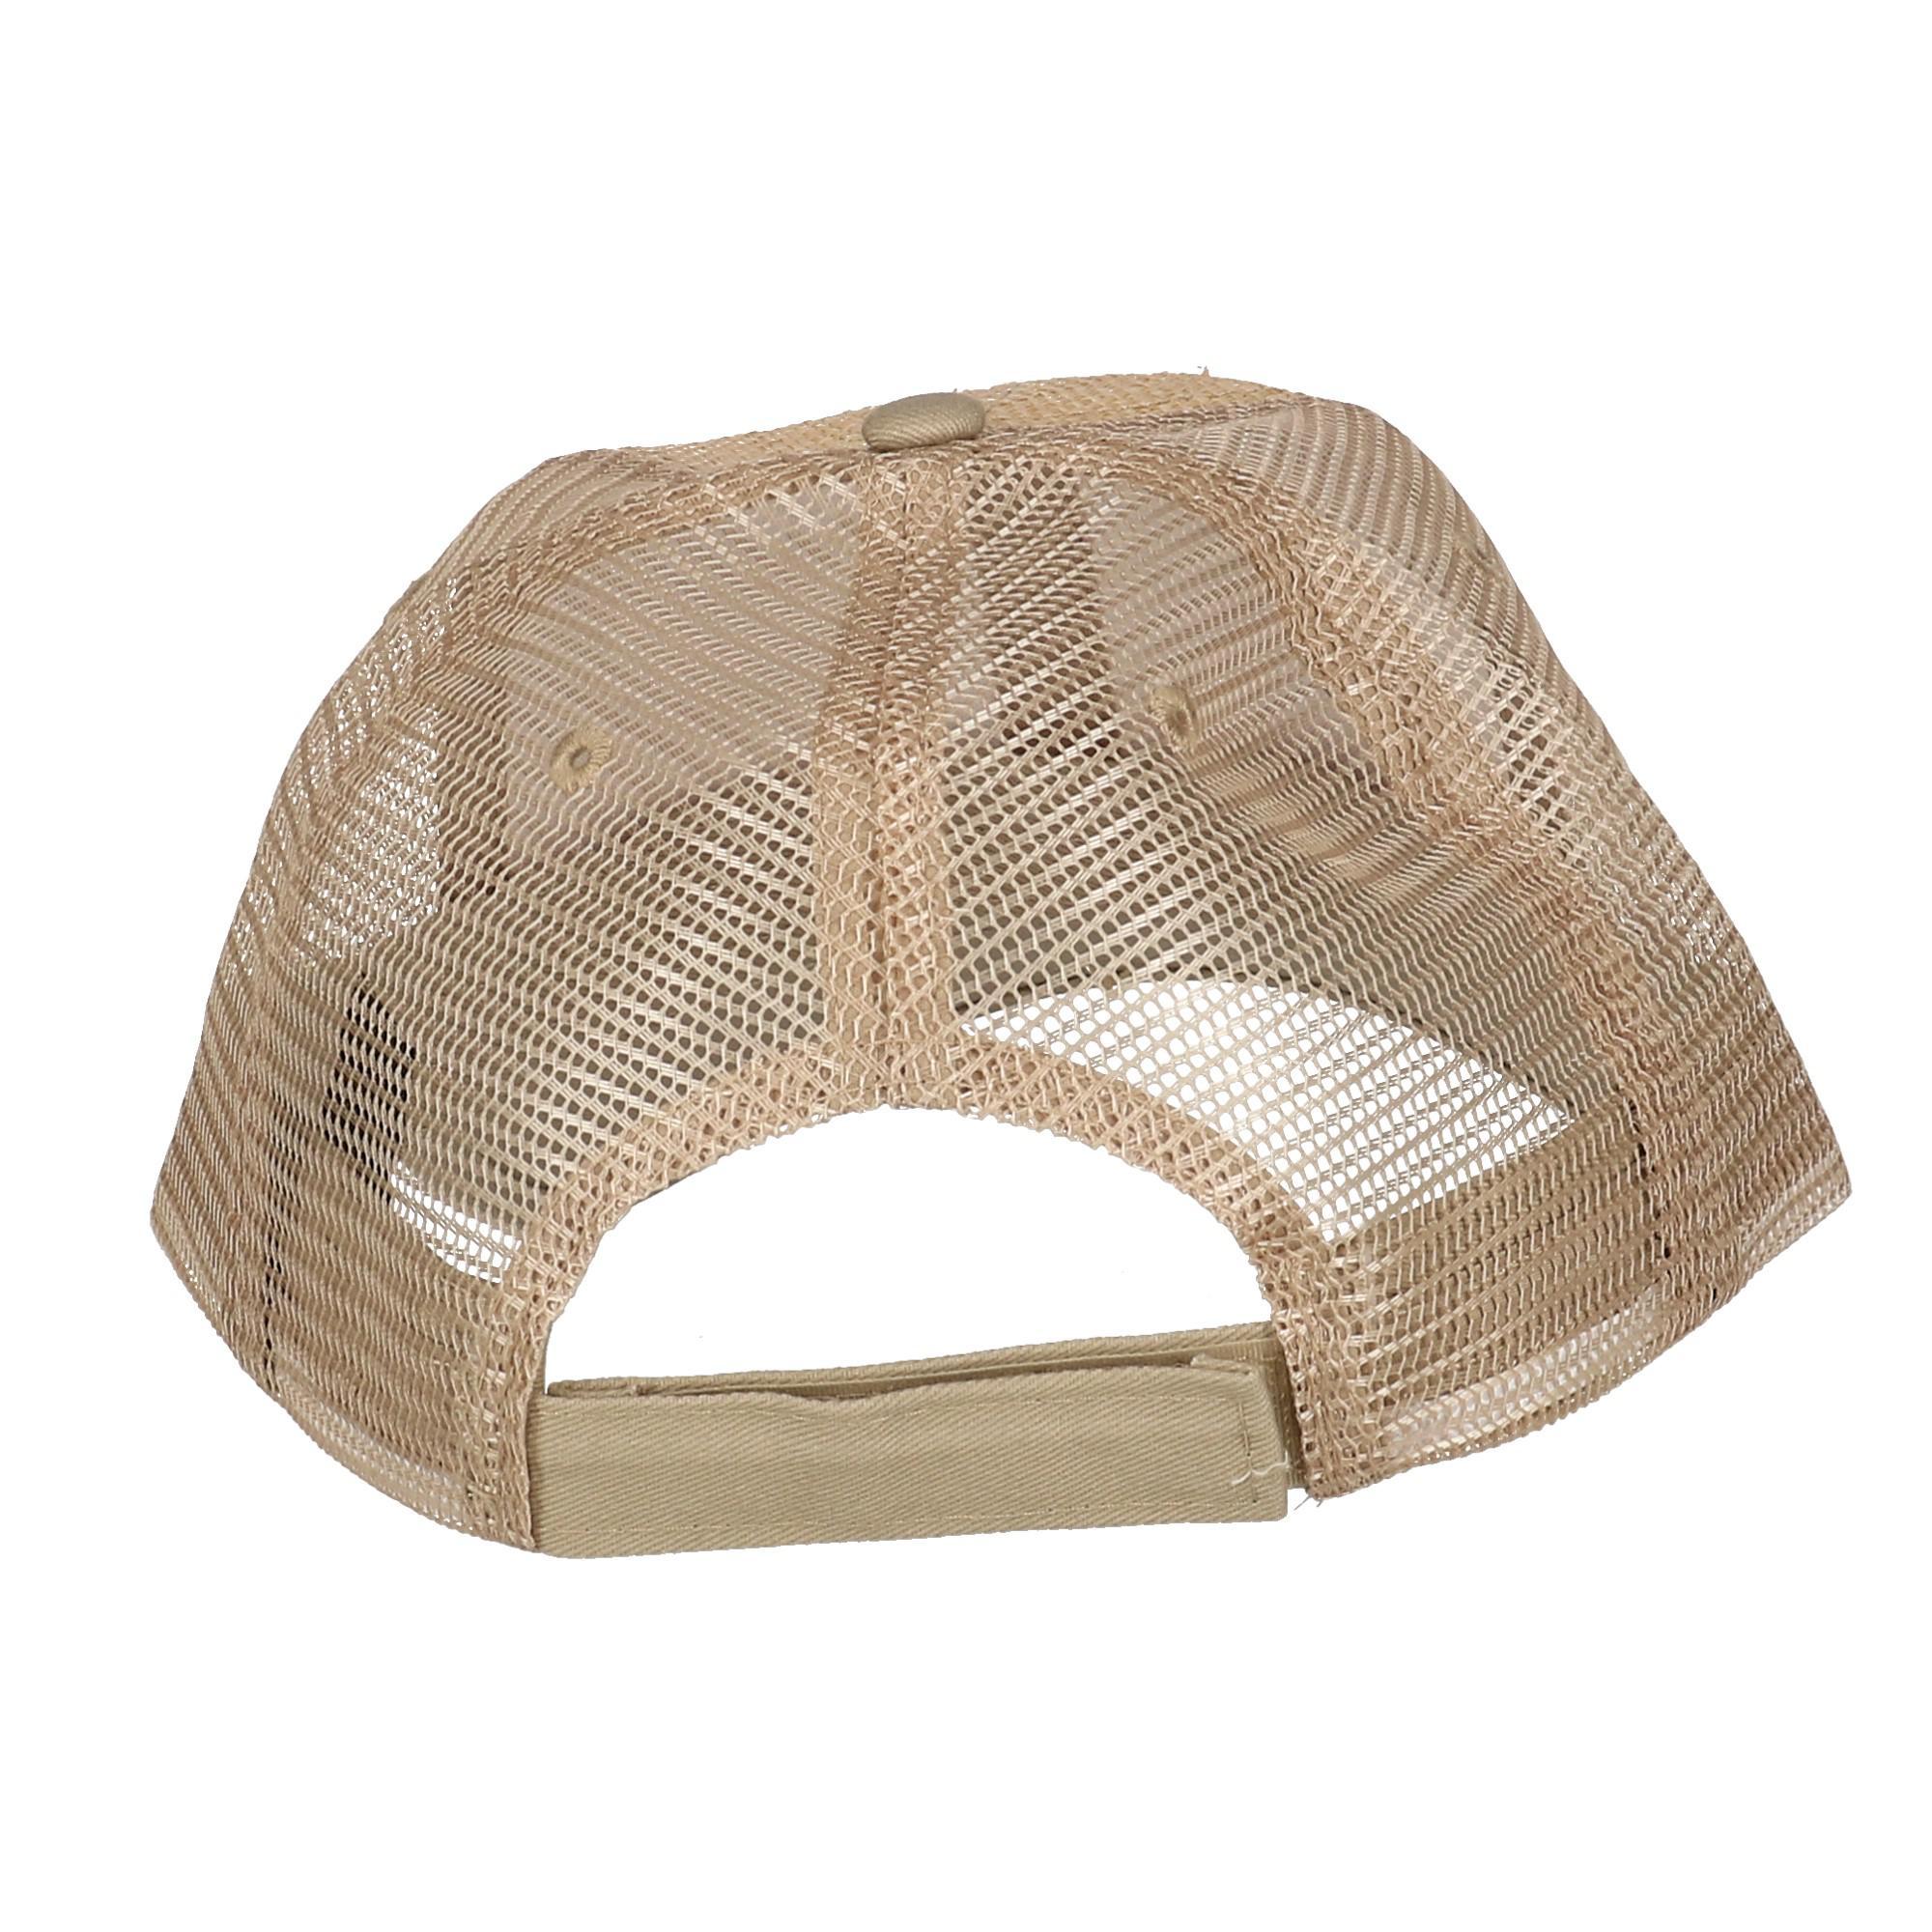 New DPC Outdoor Design Cap Men's Structured Raffia Baseball Cap Design with Mesh Back 493ecf